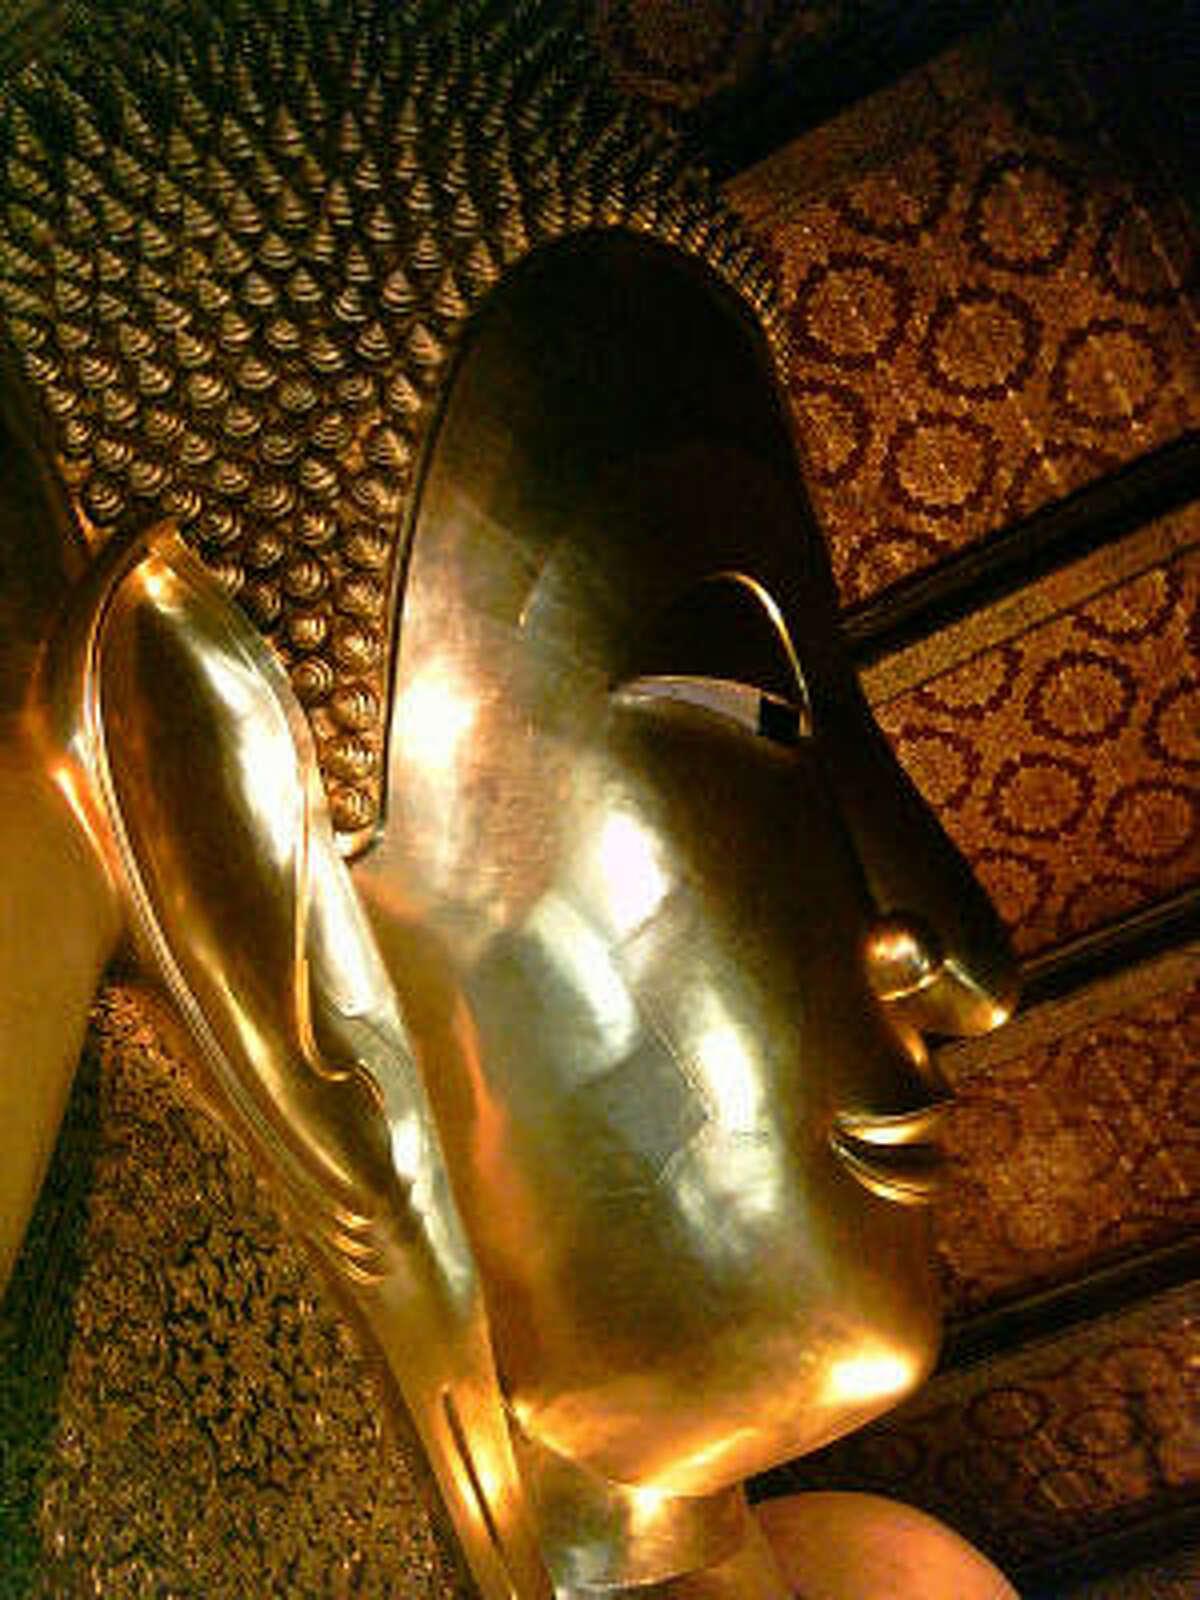 The Reclining Buddha at Wat Po temple near Thailand's Grand Palace in Bangkok.